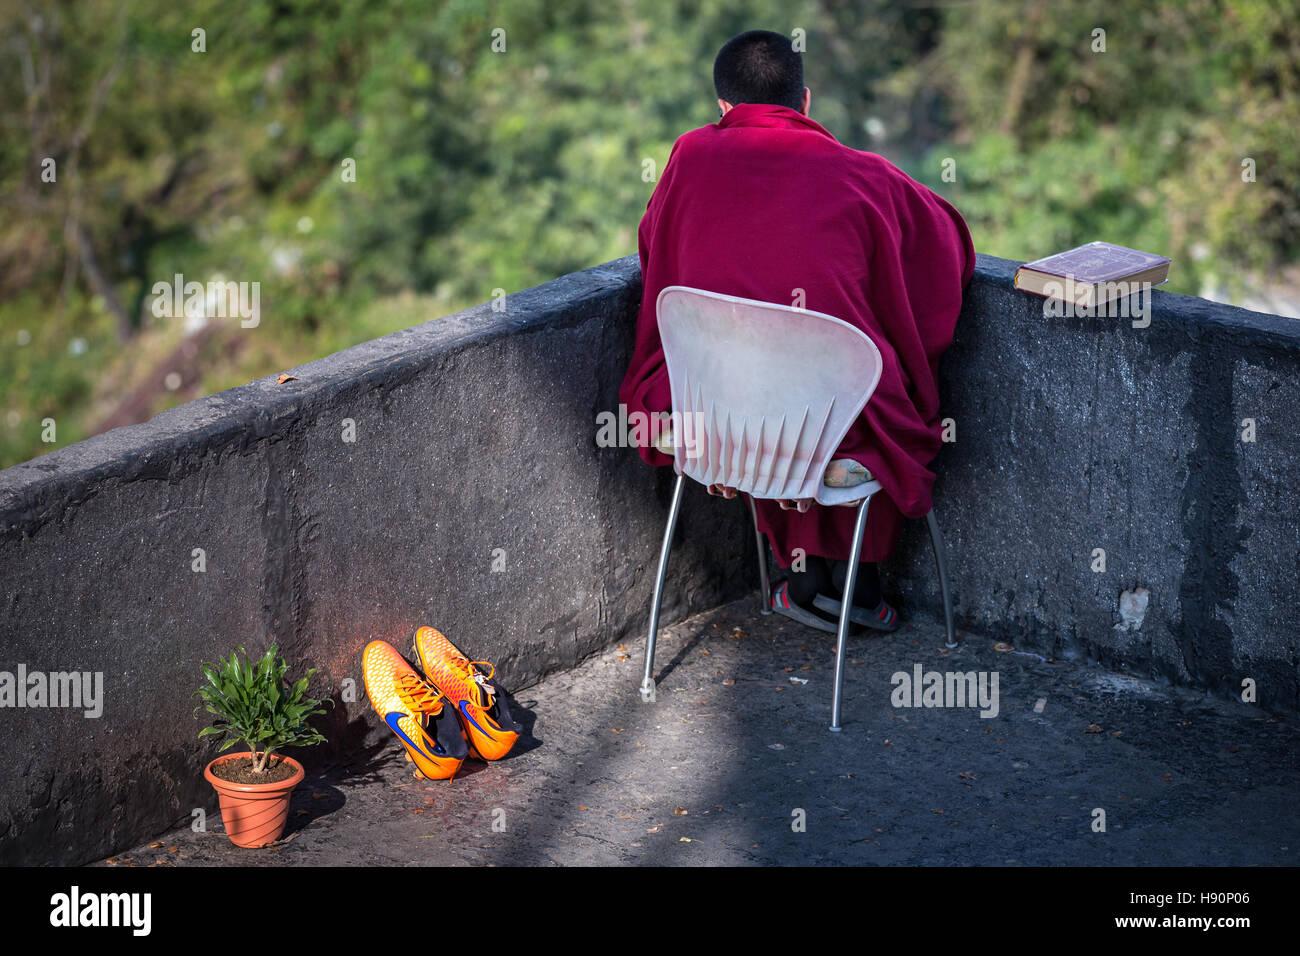 A young monk resting, McLeod Ganj, Dharamsala, Himachal Pradesh, India - Stock Image